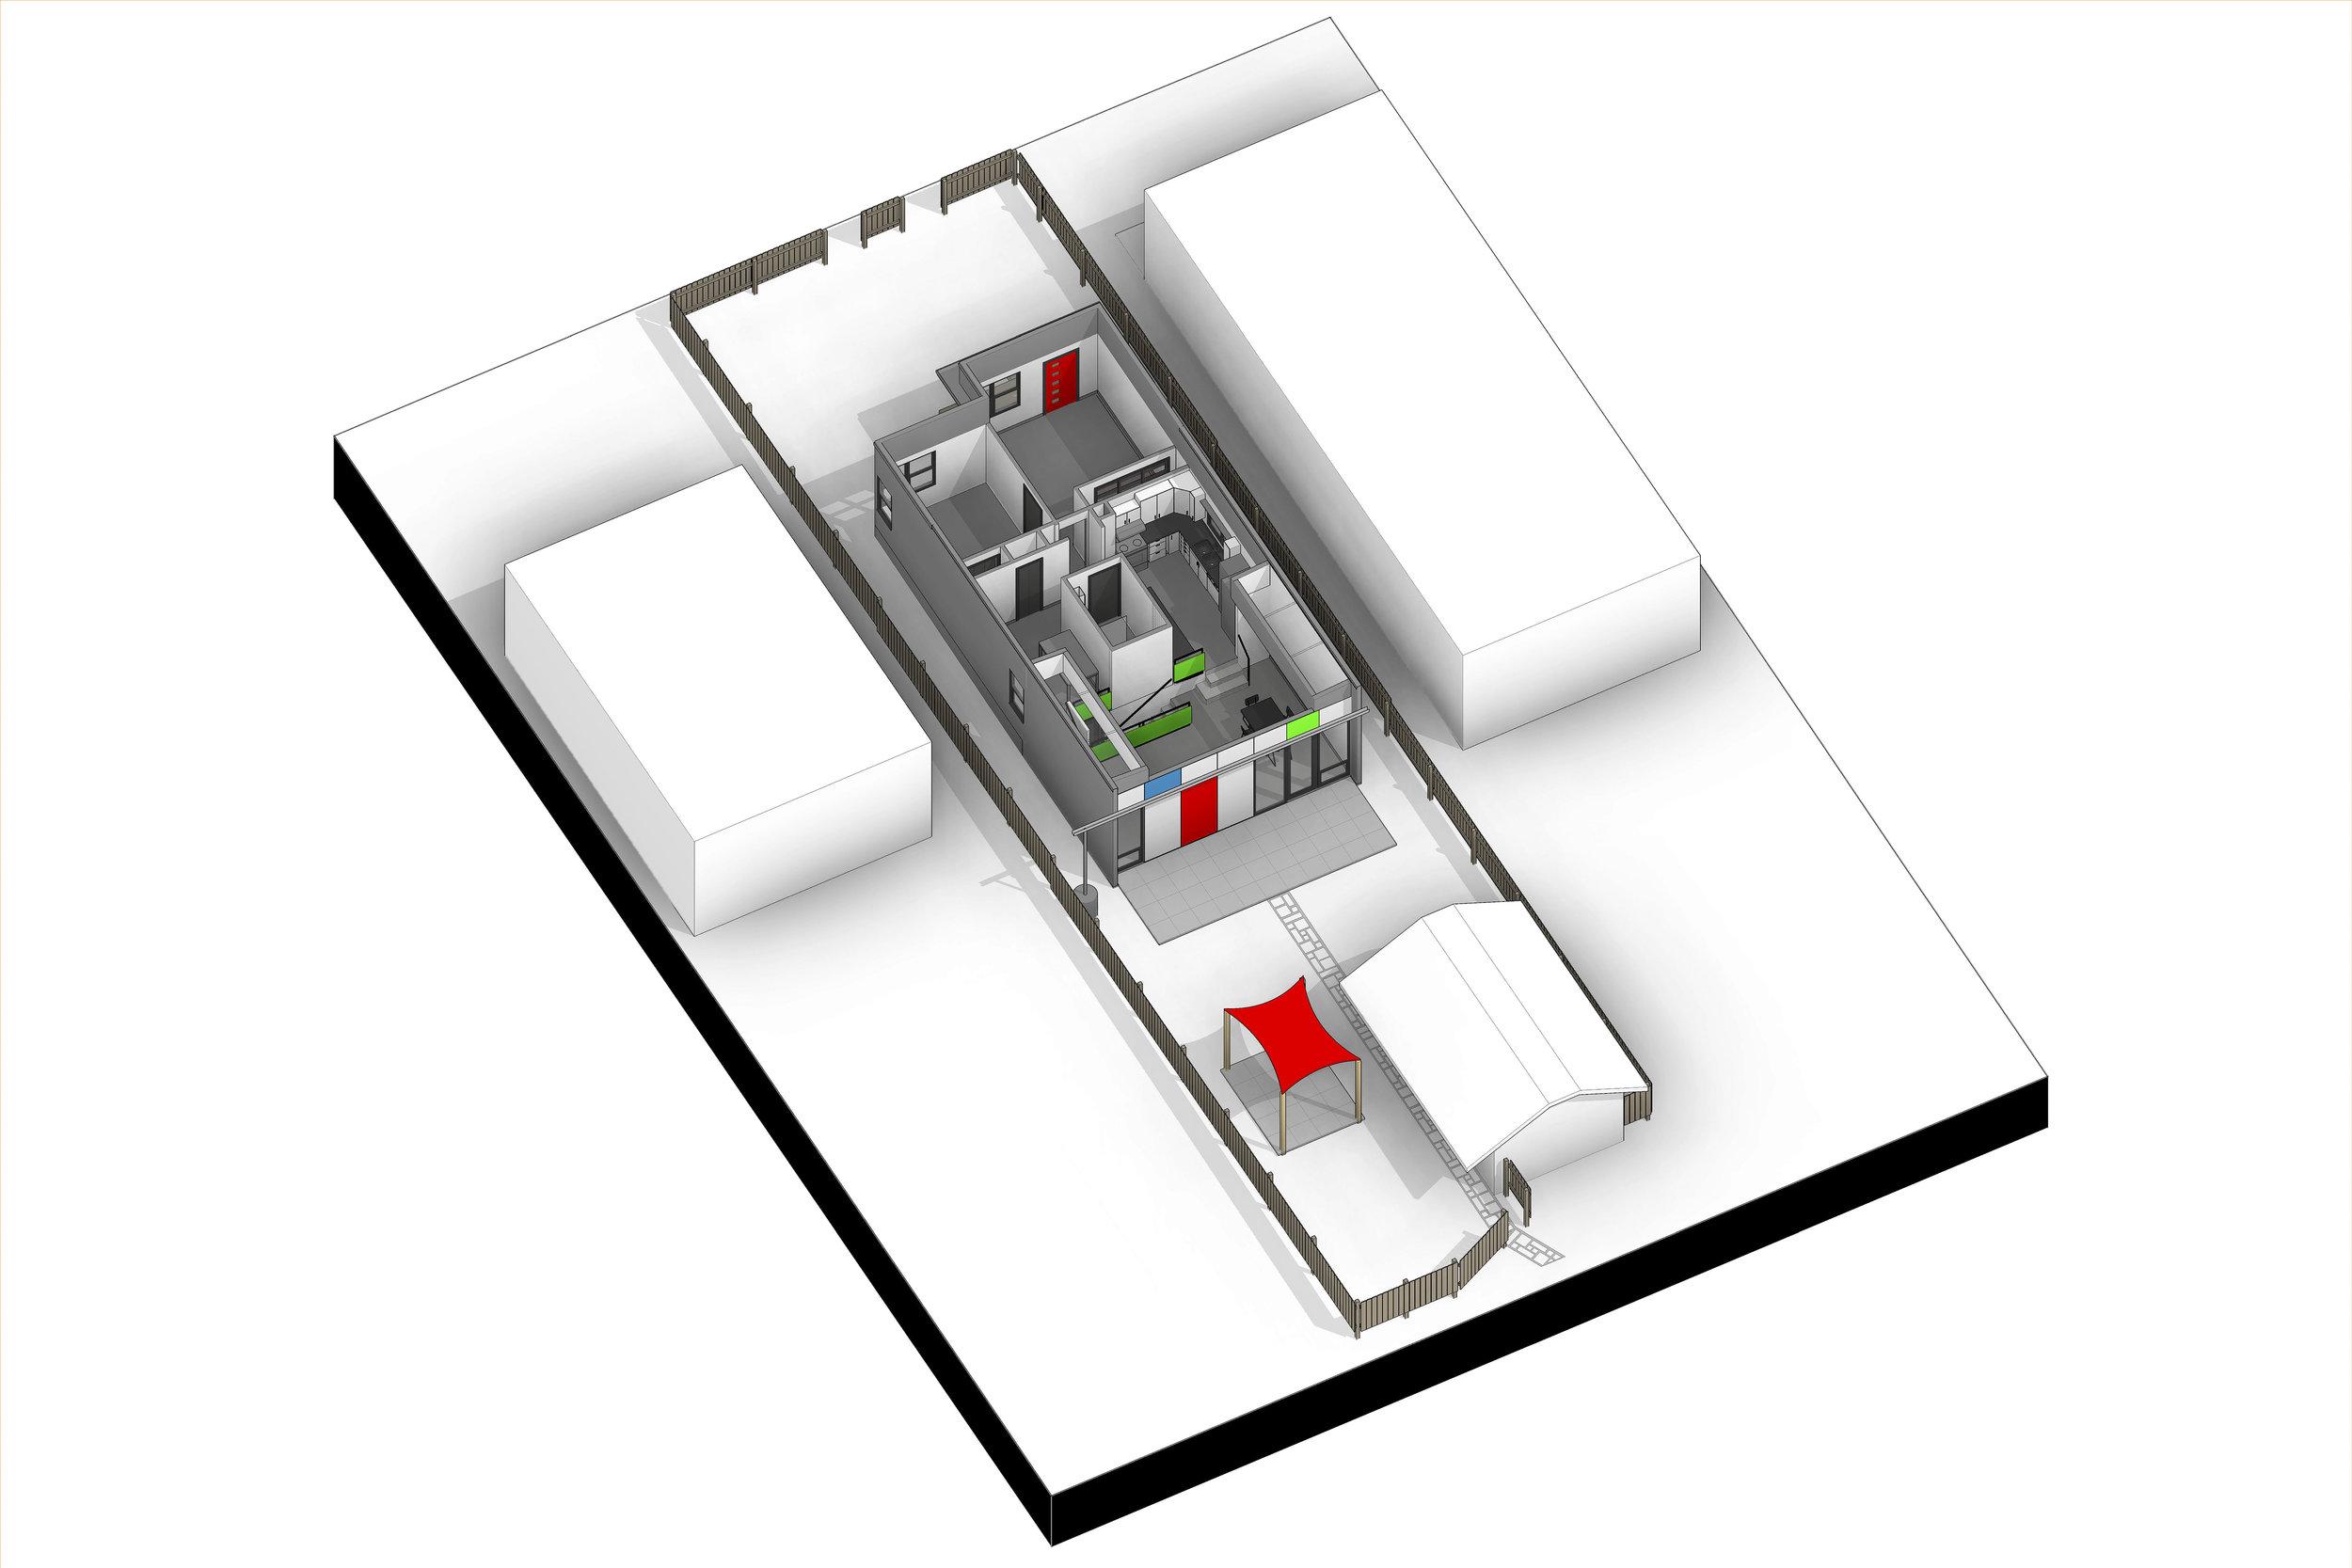 161217 - 383 Braid - 2 NW Isometric - website size.jpg